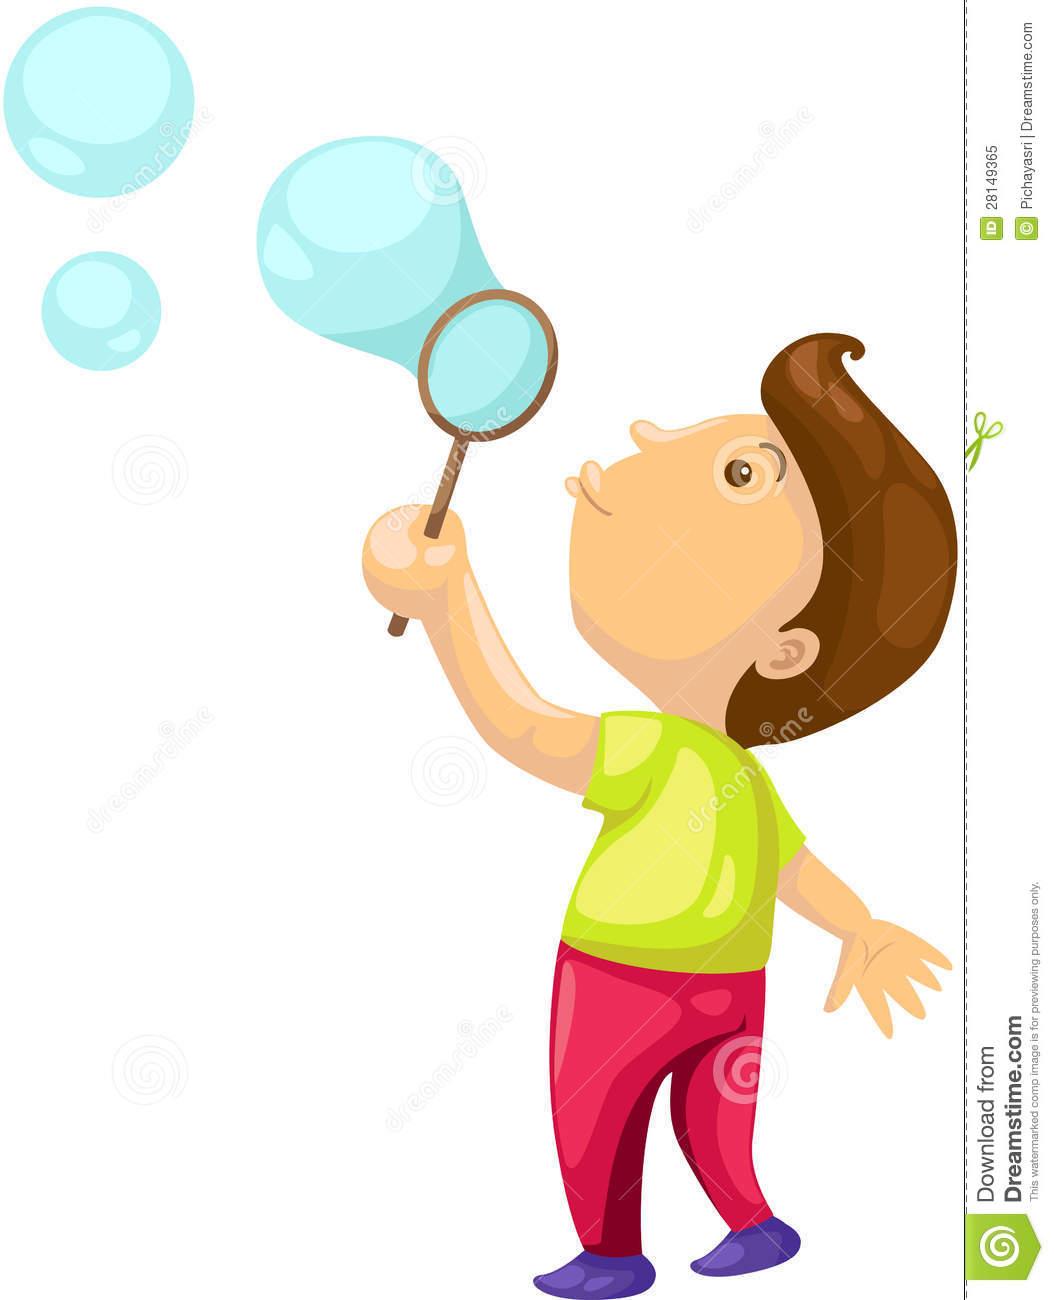 Bubbling bubbles clipart - Clipground